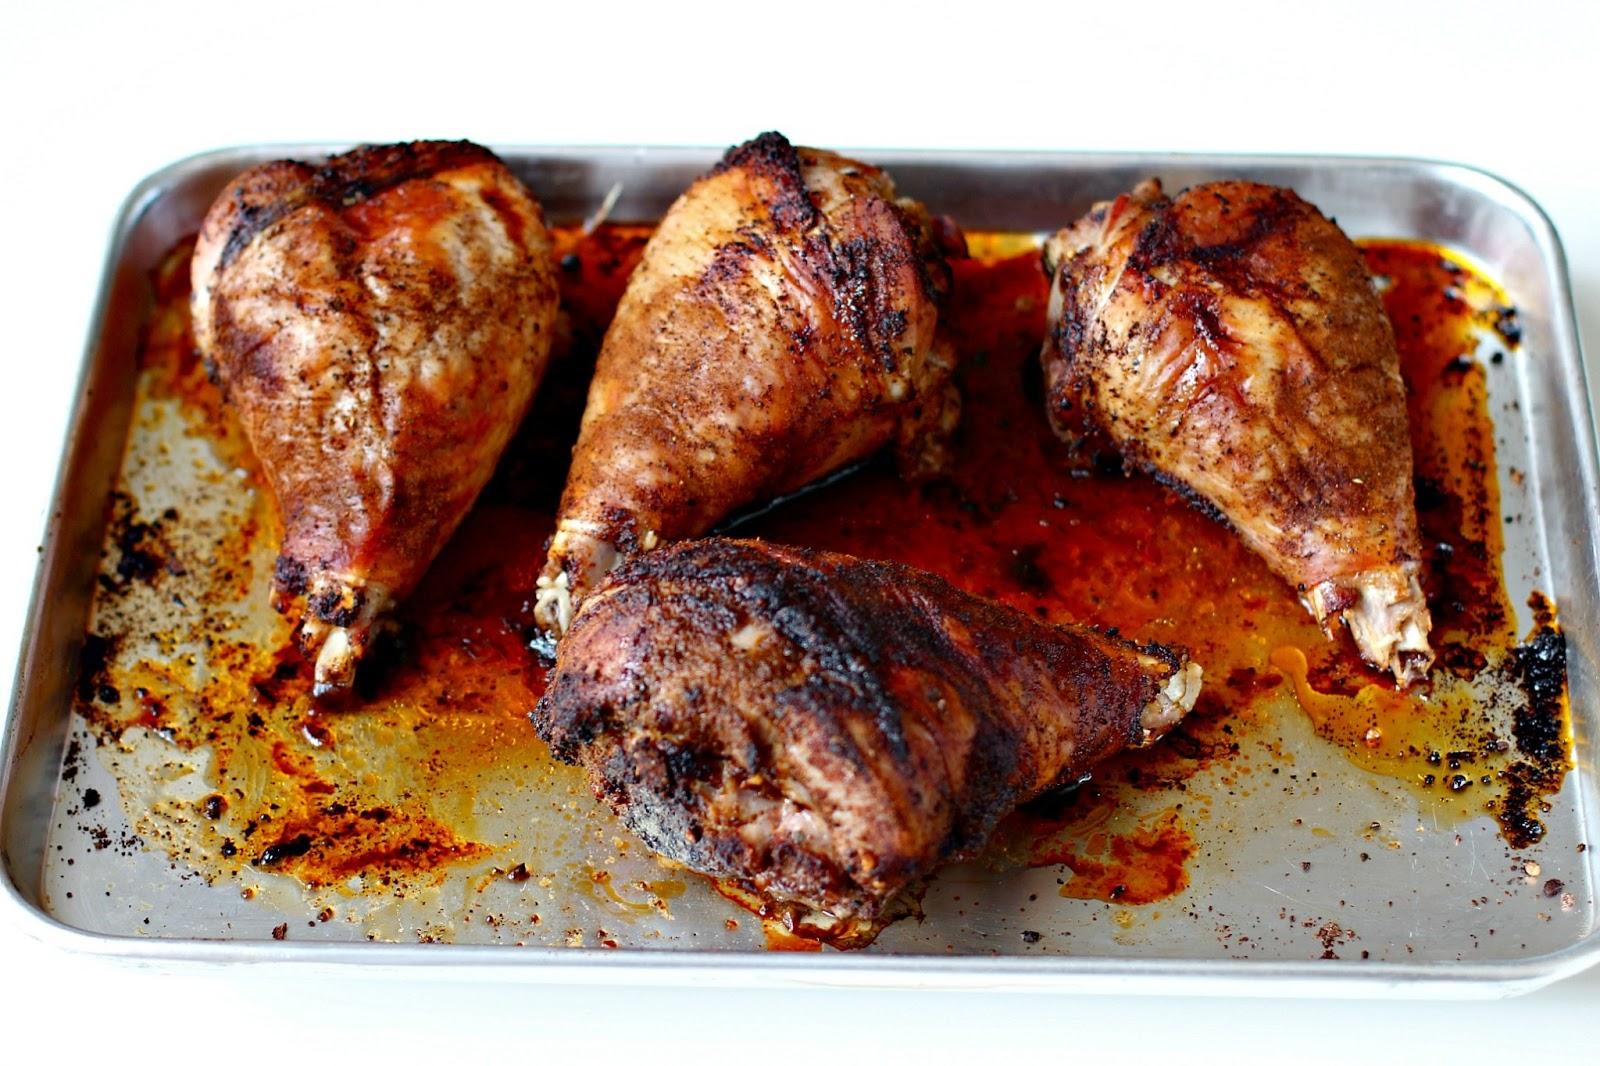 Milk and Honey: Caveman Pops (aka Roasted Turkey Legs)